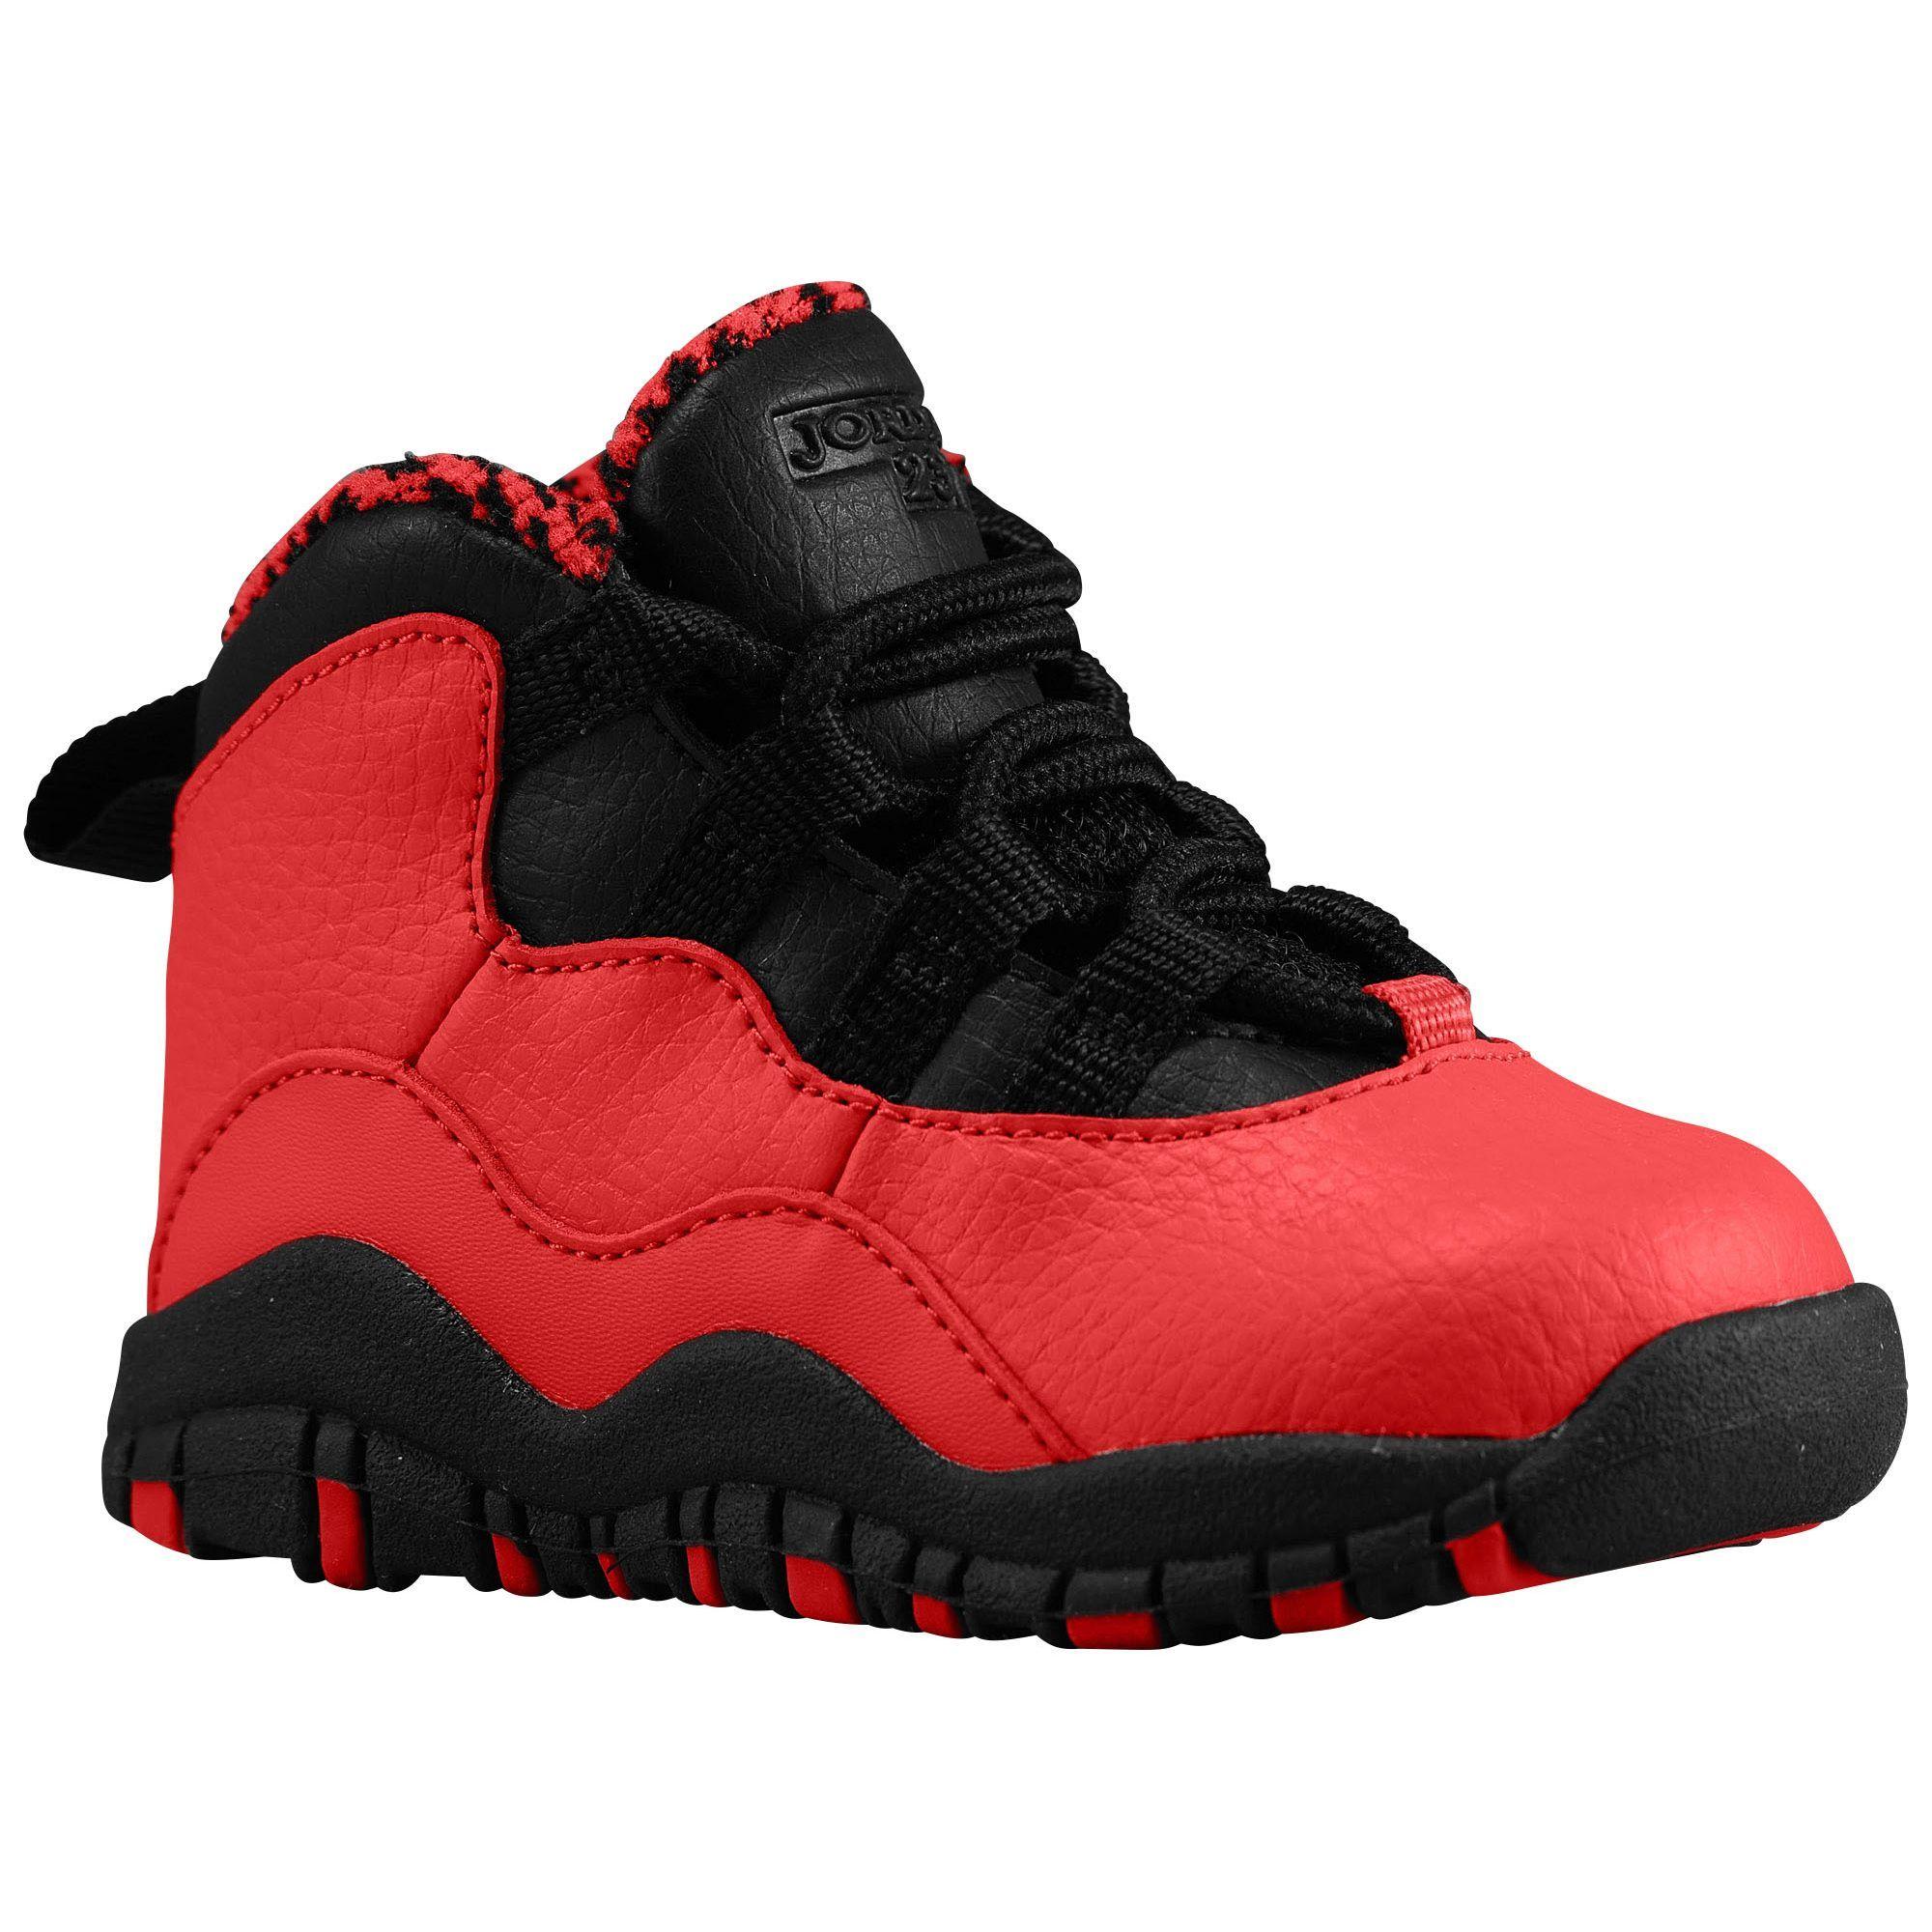 half off 419c8 154db Jordan Retro 10 - Girls  Toddler - Shoes